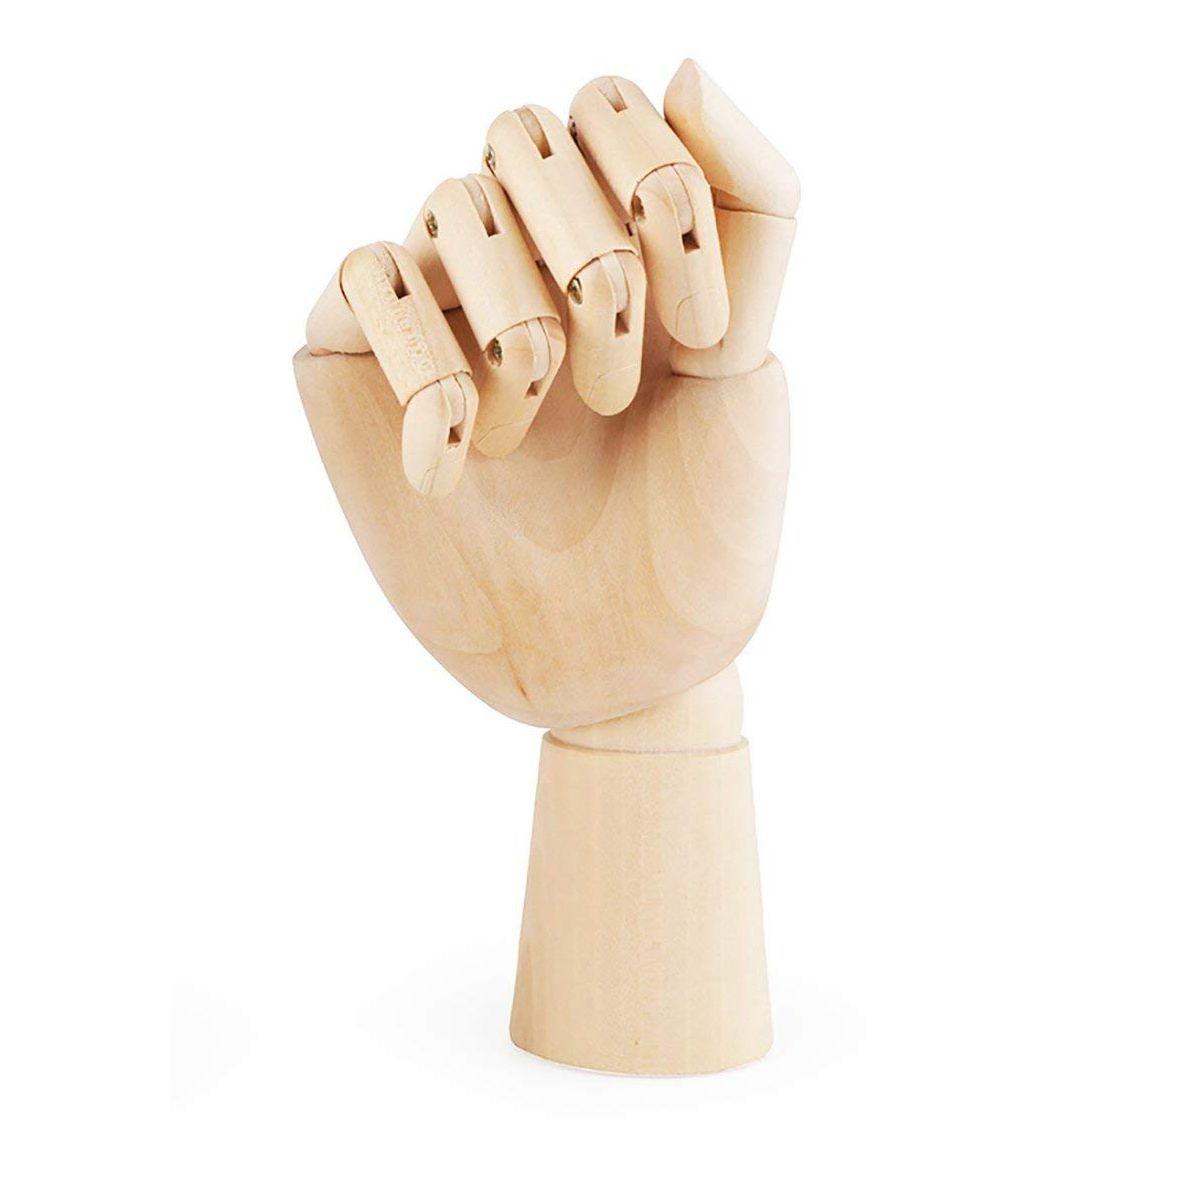 18X6cm Wooden Artist Right Hand Gift Art Alternatives SKETCH Flexible Decoracao